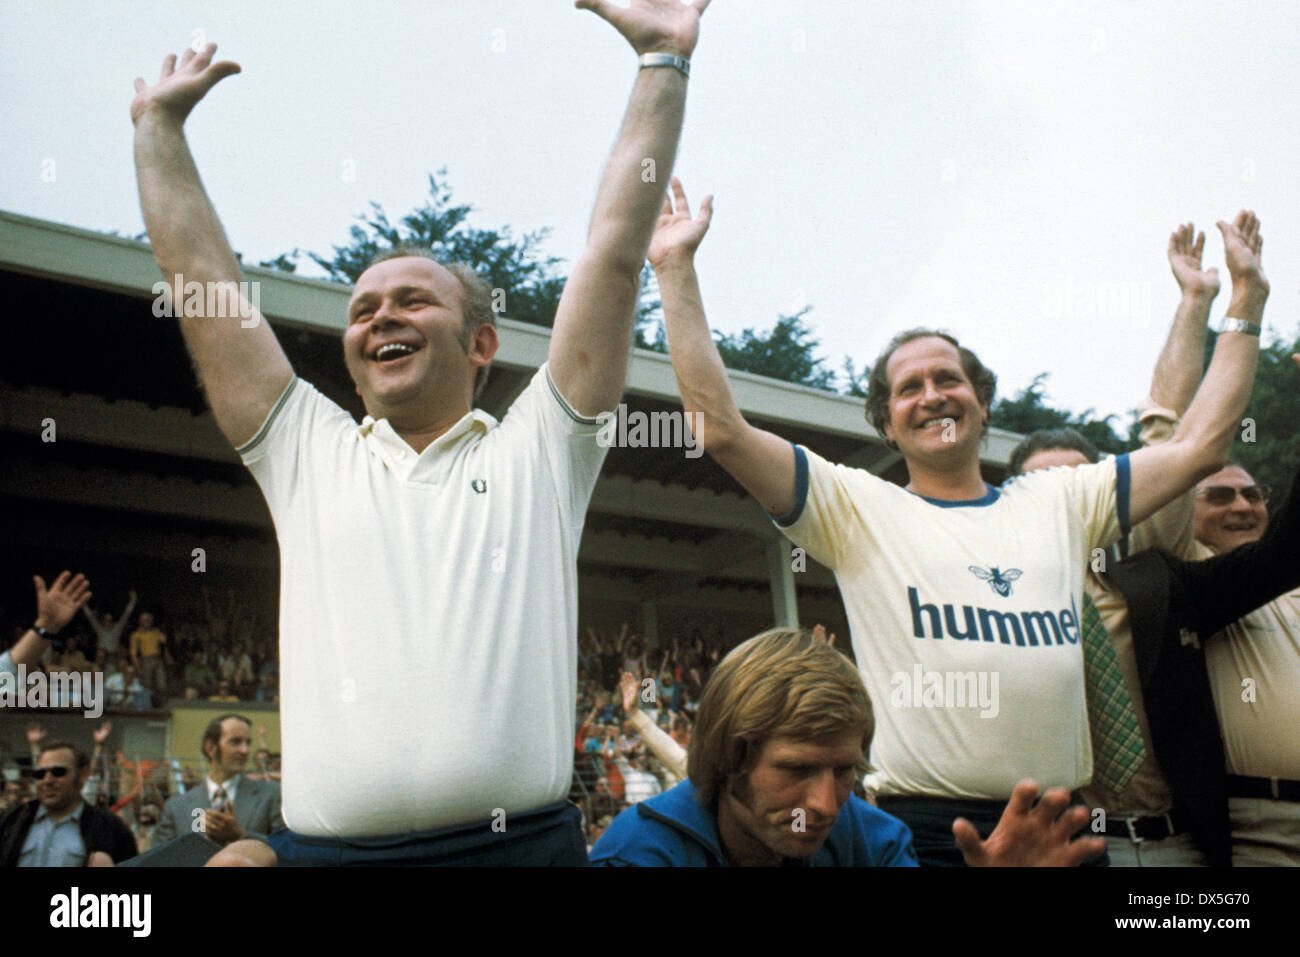 football, 2. Bundesliga Nord, 2. Bundesliga Sued, 1974/1975, relegation match to Bundesliga 1975/1976, return leg, Grotenburg Stadium in Krefeld, FC Bayer 05 Uerdingen versus FK Pirmasens 6:0, coach Klaus Quinkert (Uerdingen) right and physio Max Spielman - Stock Image